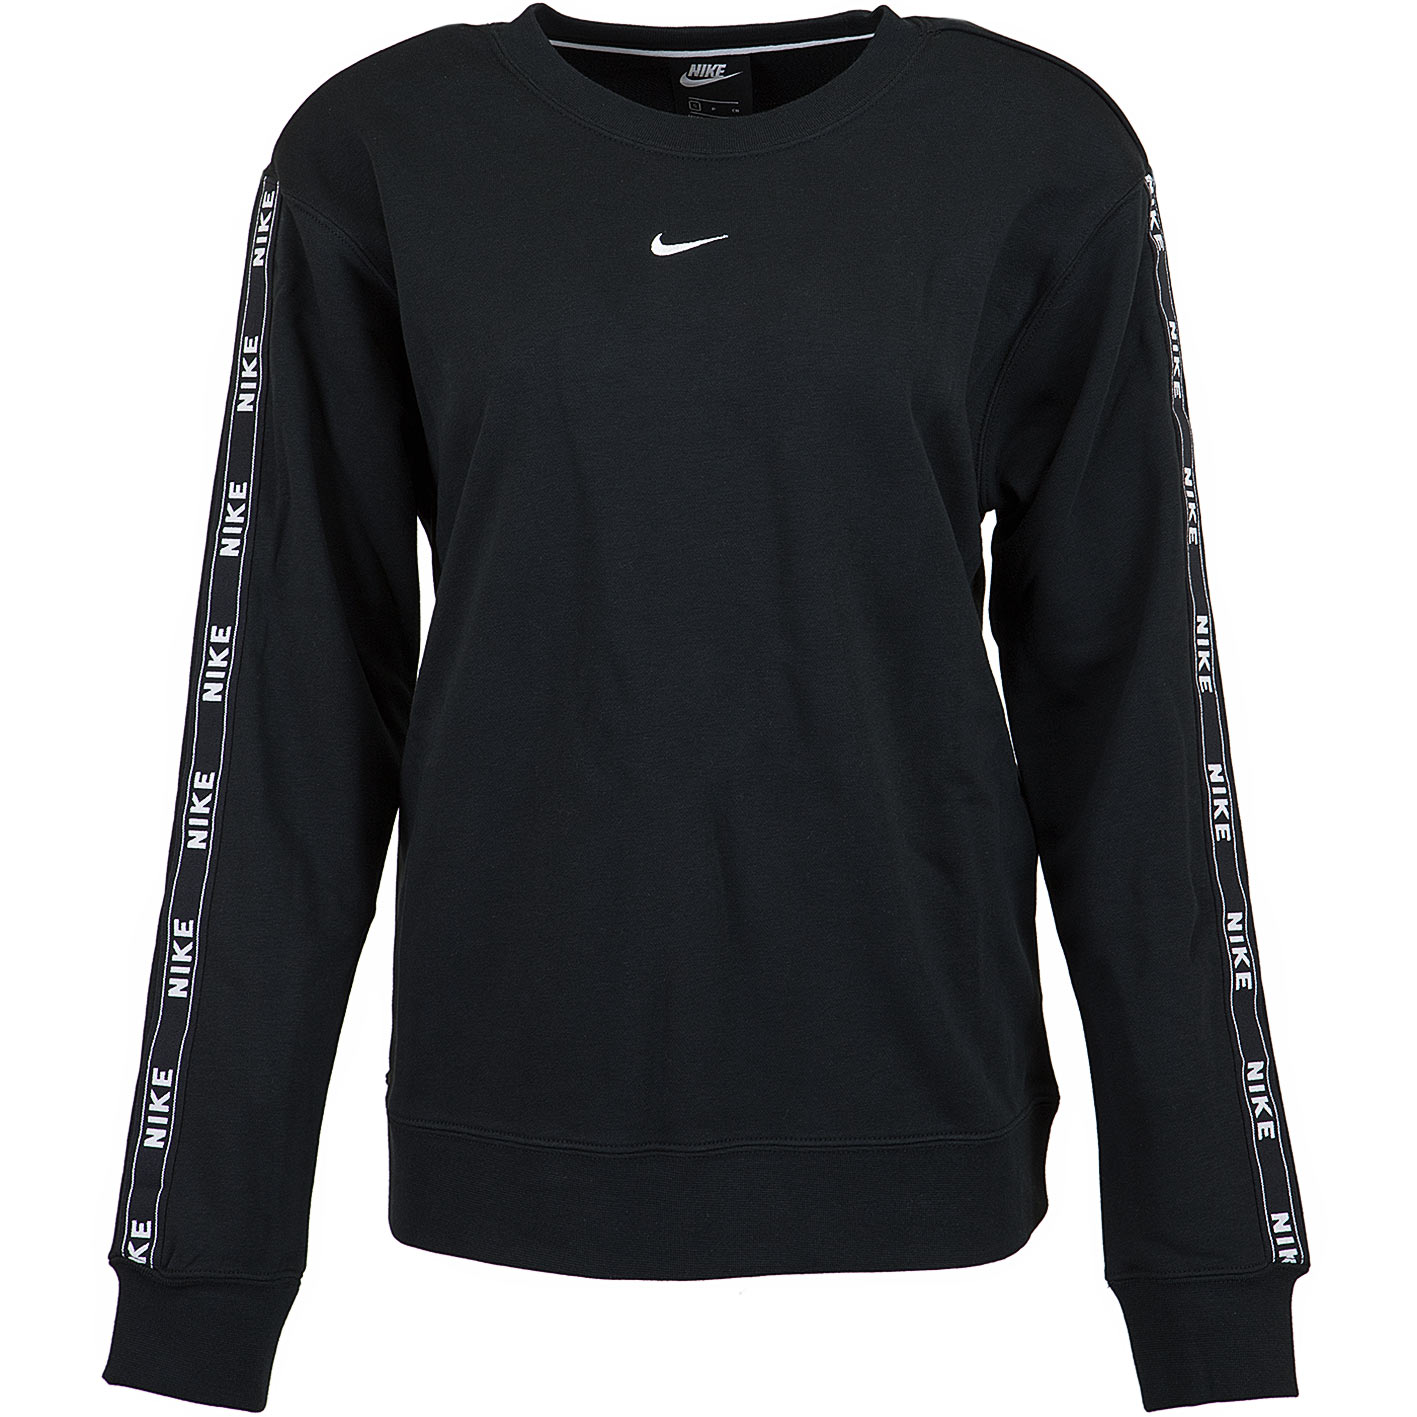 low priced fee1a 1996e Nike Damen Sweatshirt Logo Tape schwarz/weiß